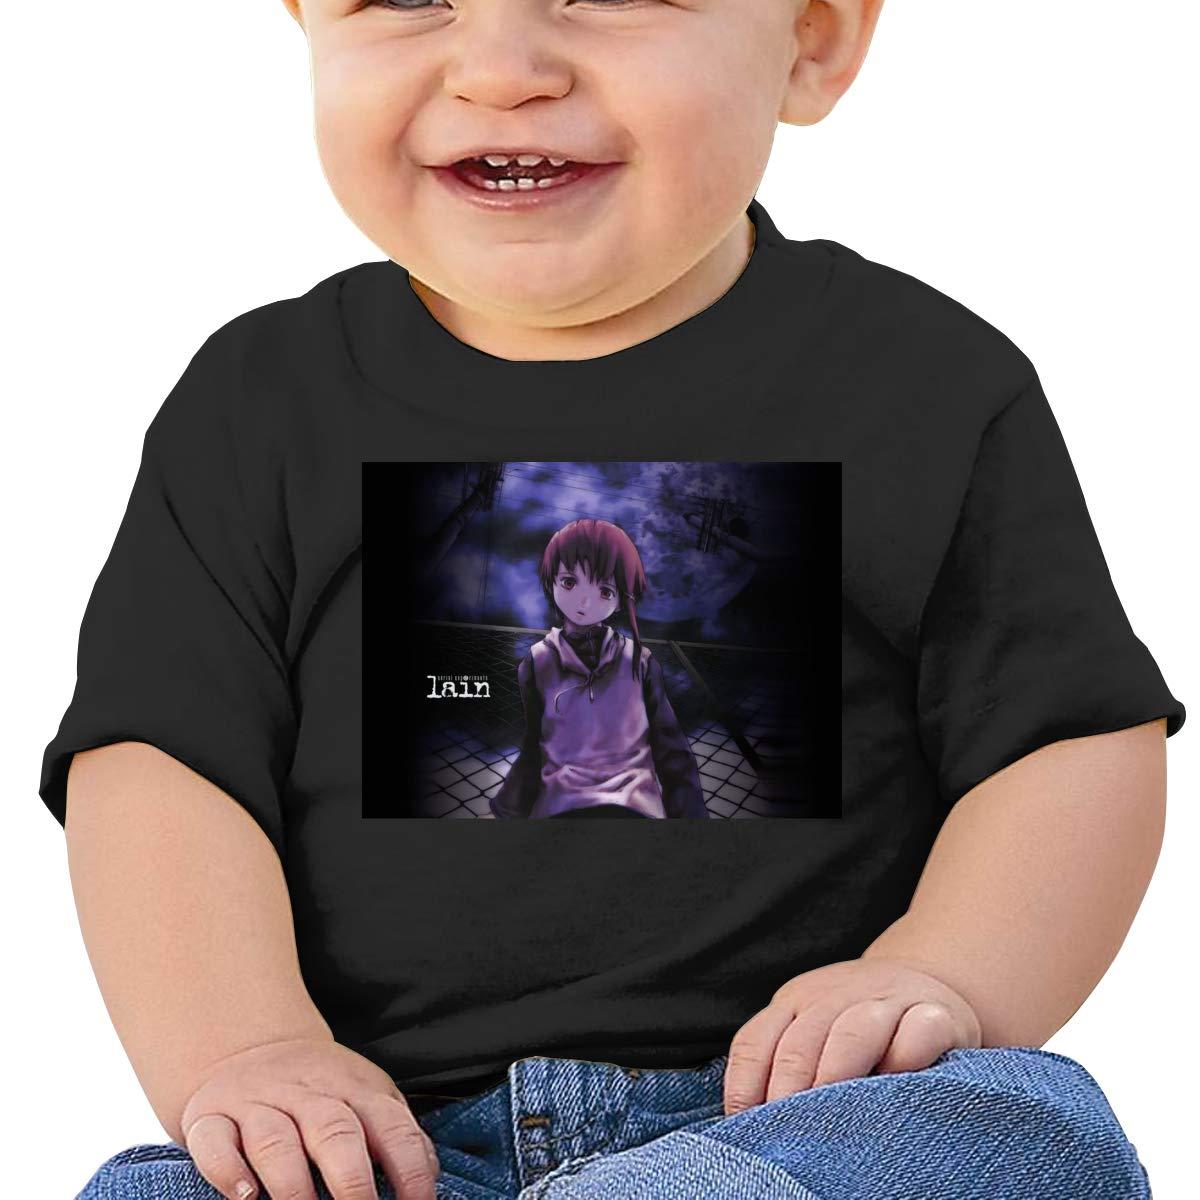 Kangtians Baby Serial Experiments Lain Short Sleeve Shirt Toddler Tee